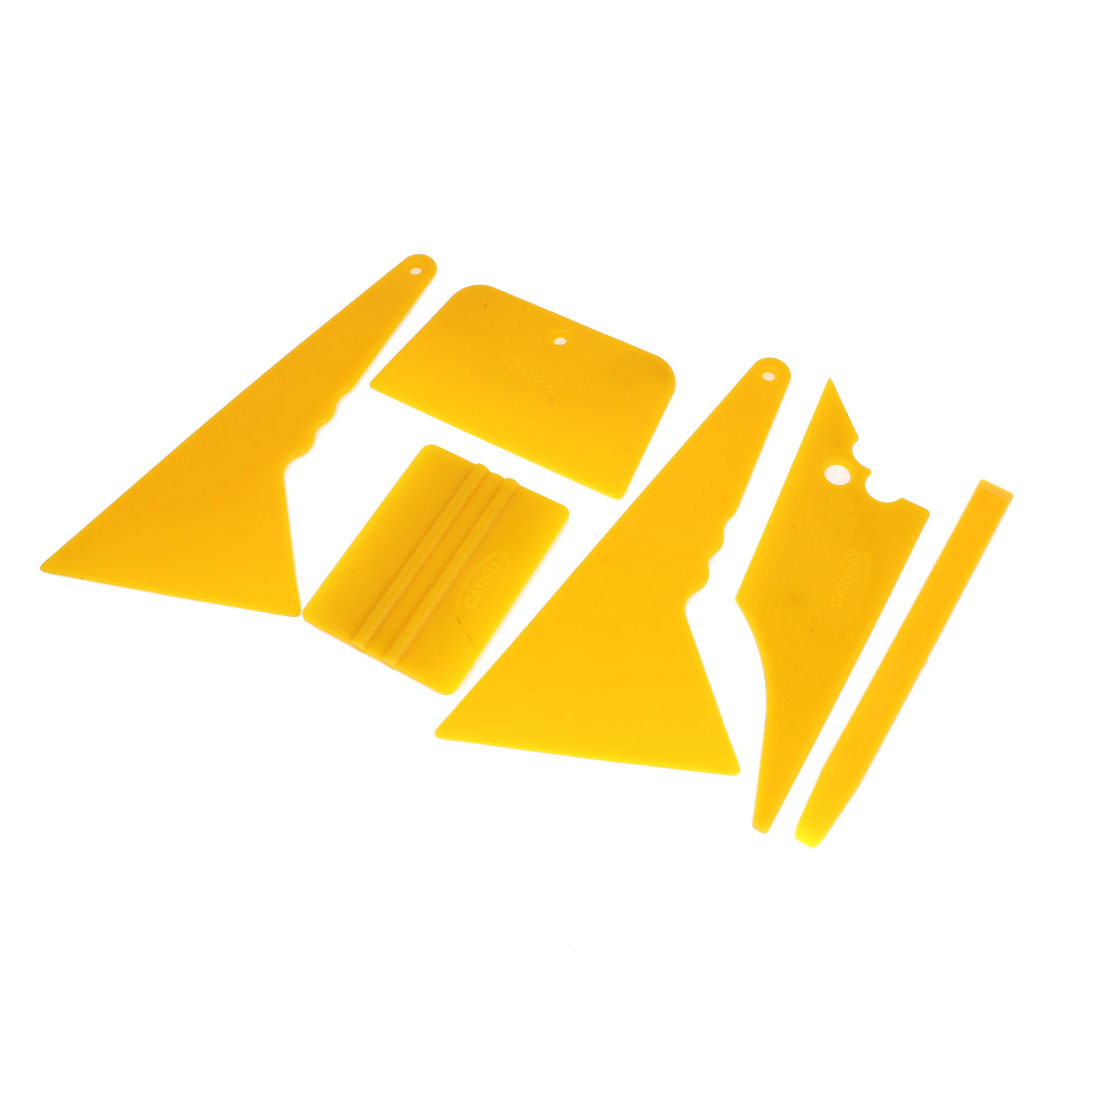 UXCELL Yellow Car Window Tint Tool Vinyl Film Scraper Installation Kit Set